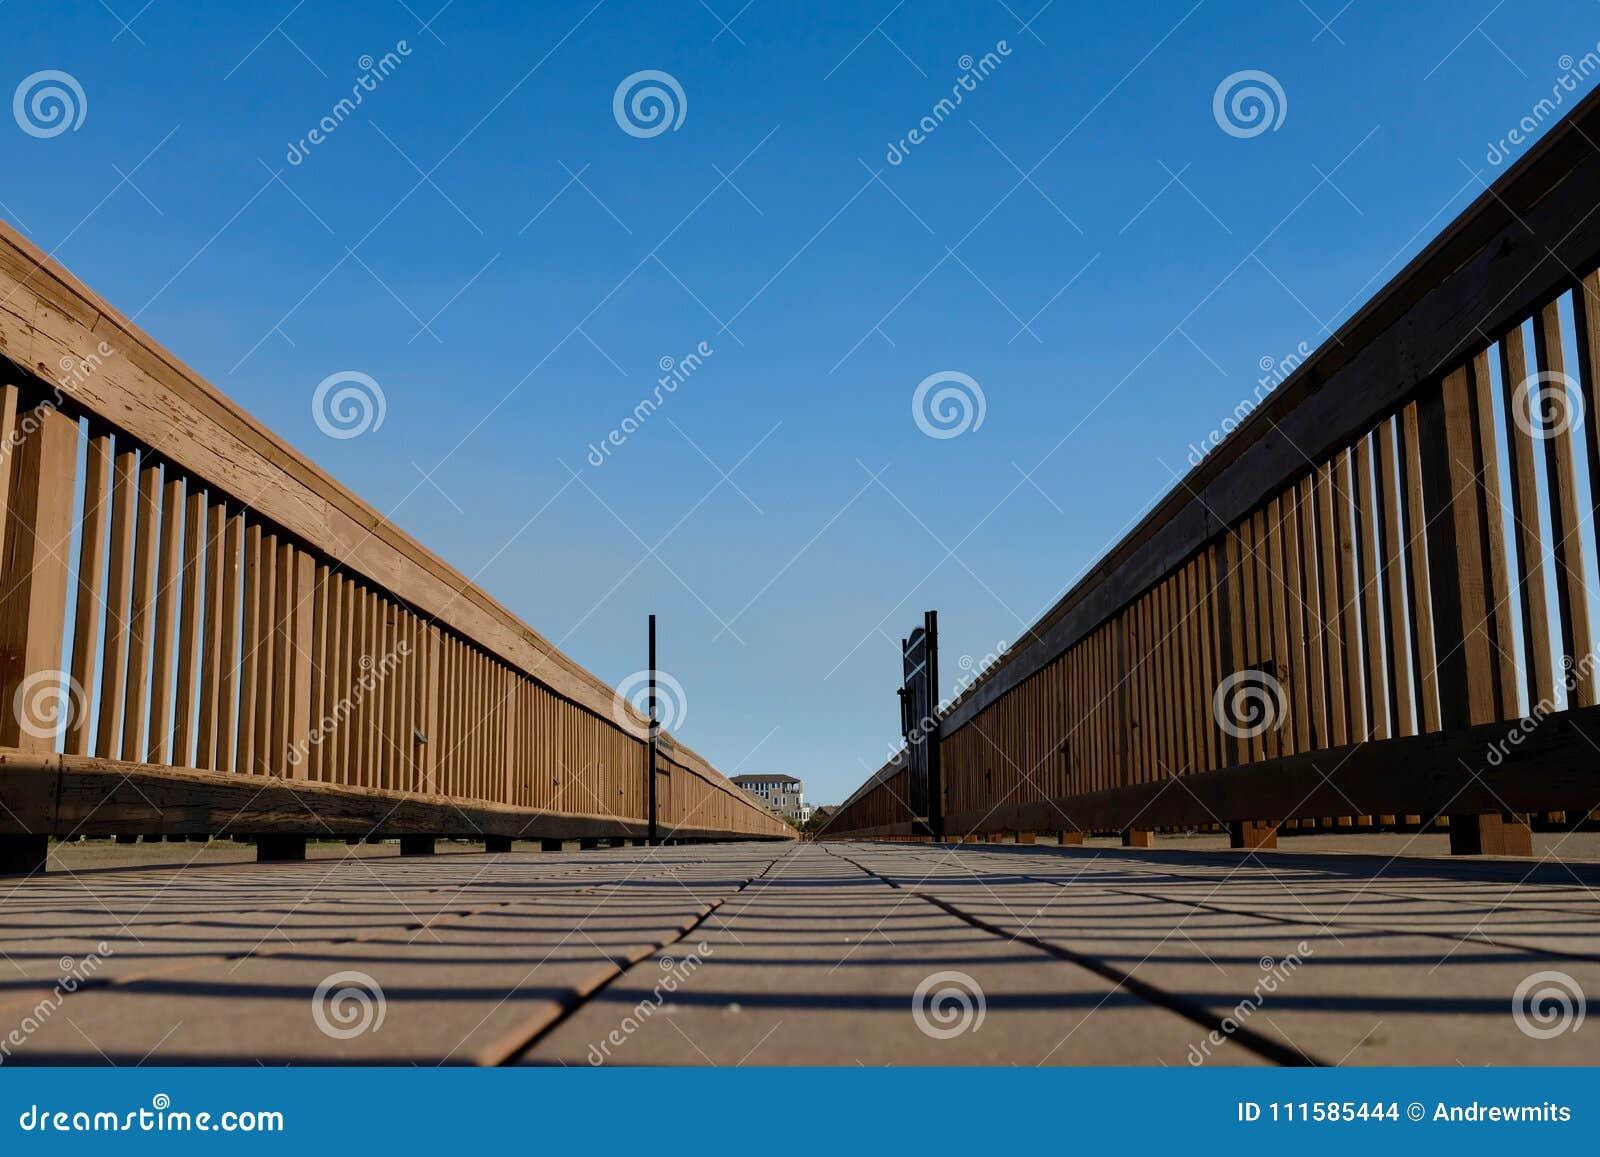 Wooden Boardwalk Ground Level Perspective to Vanishing Point